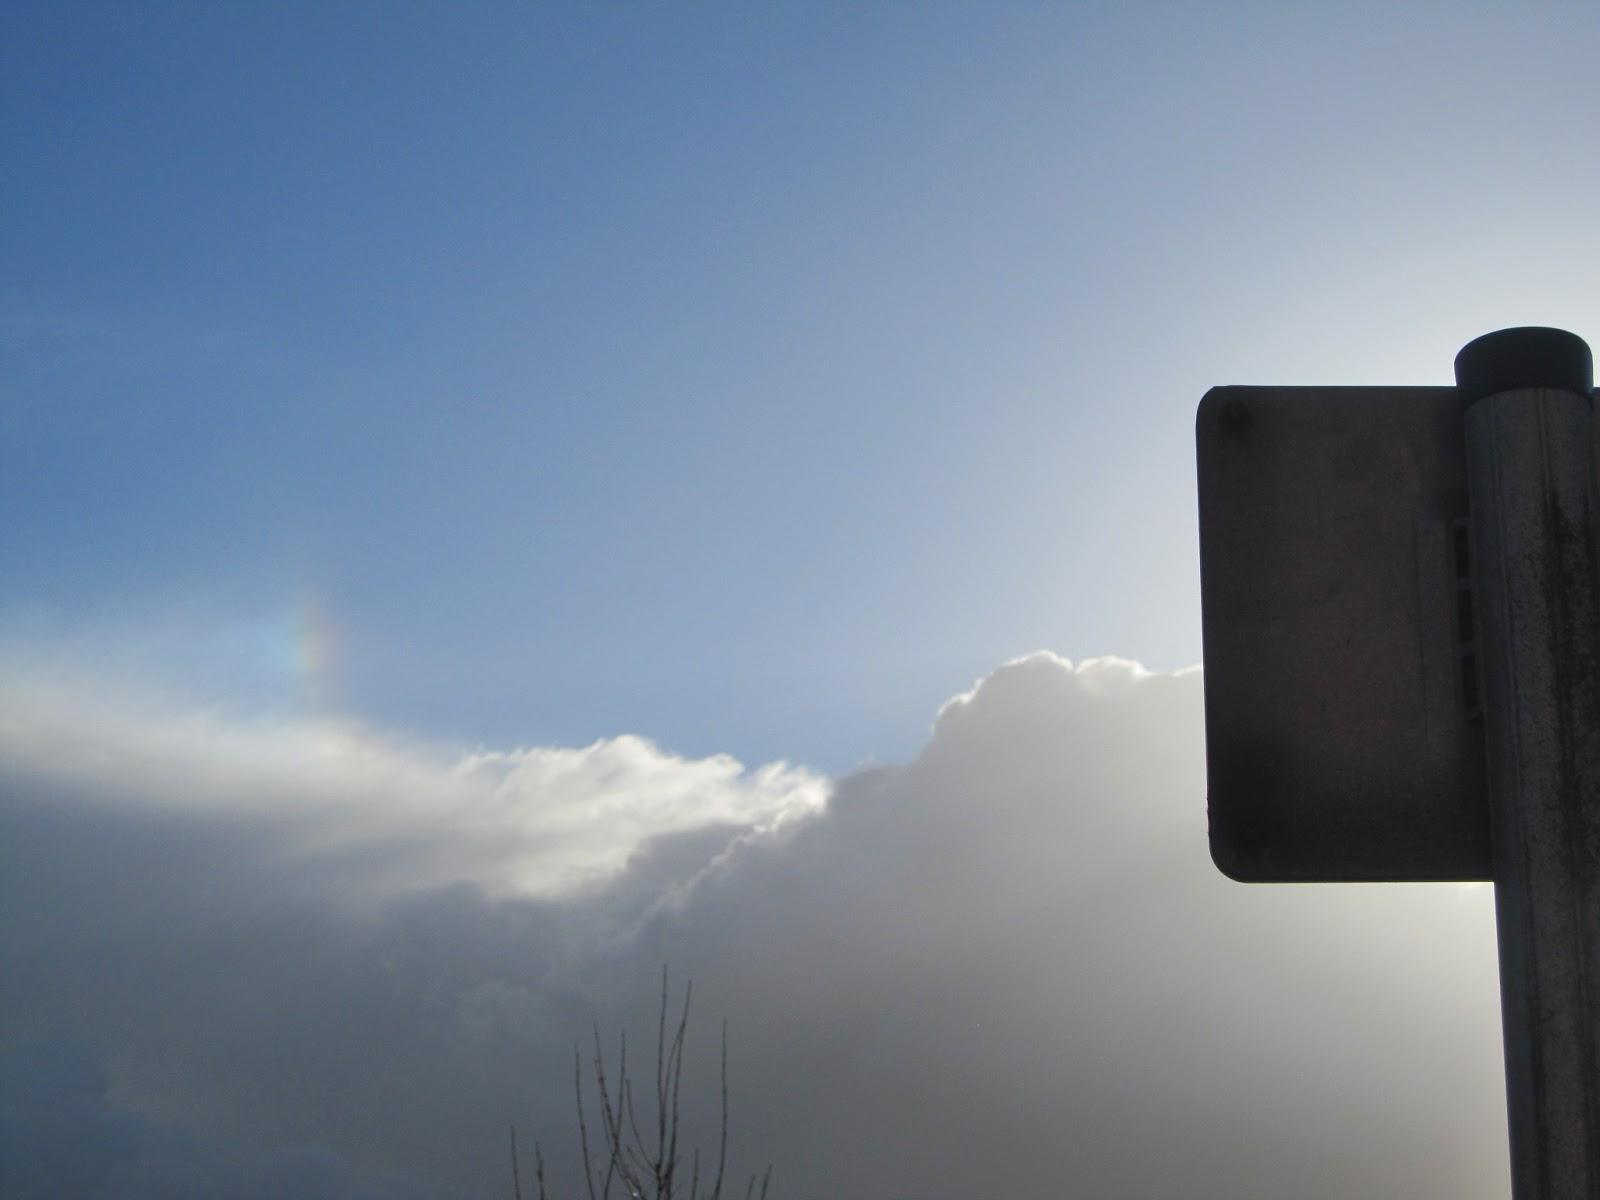 rainbow_sundog_above_clouds+010.JPG